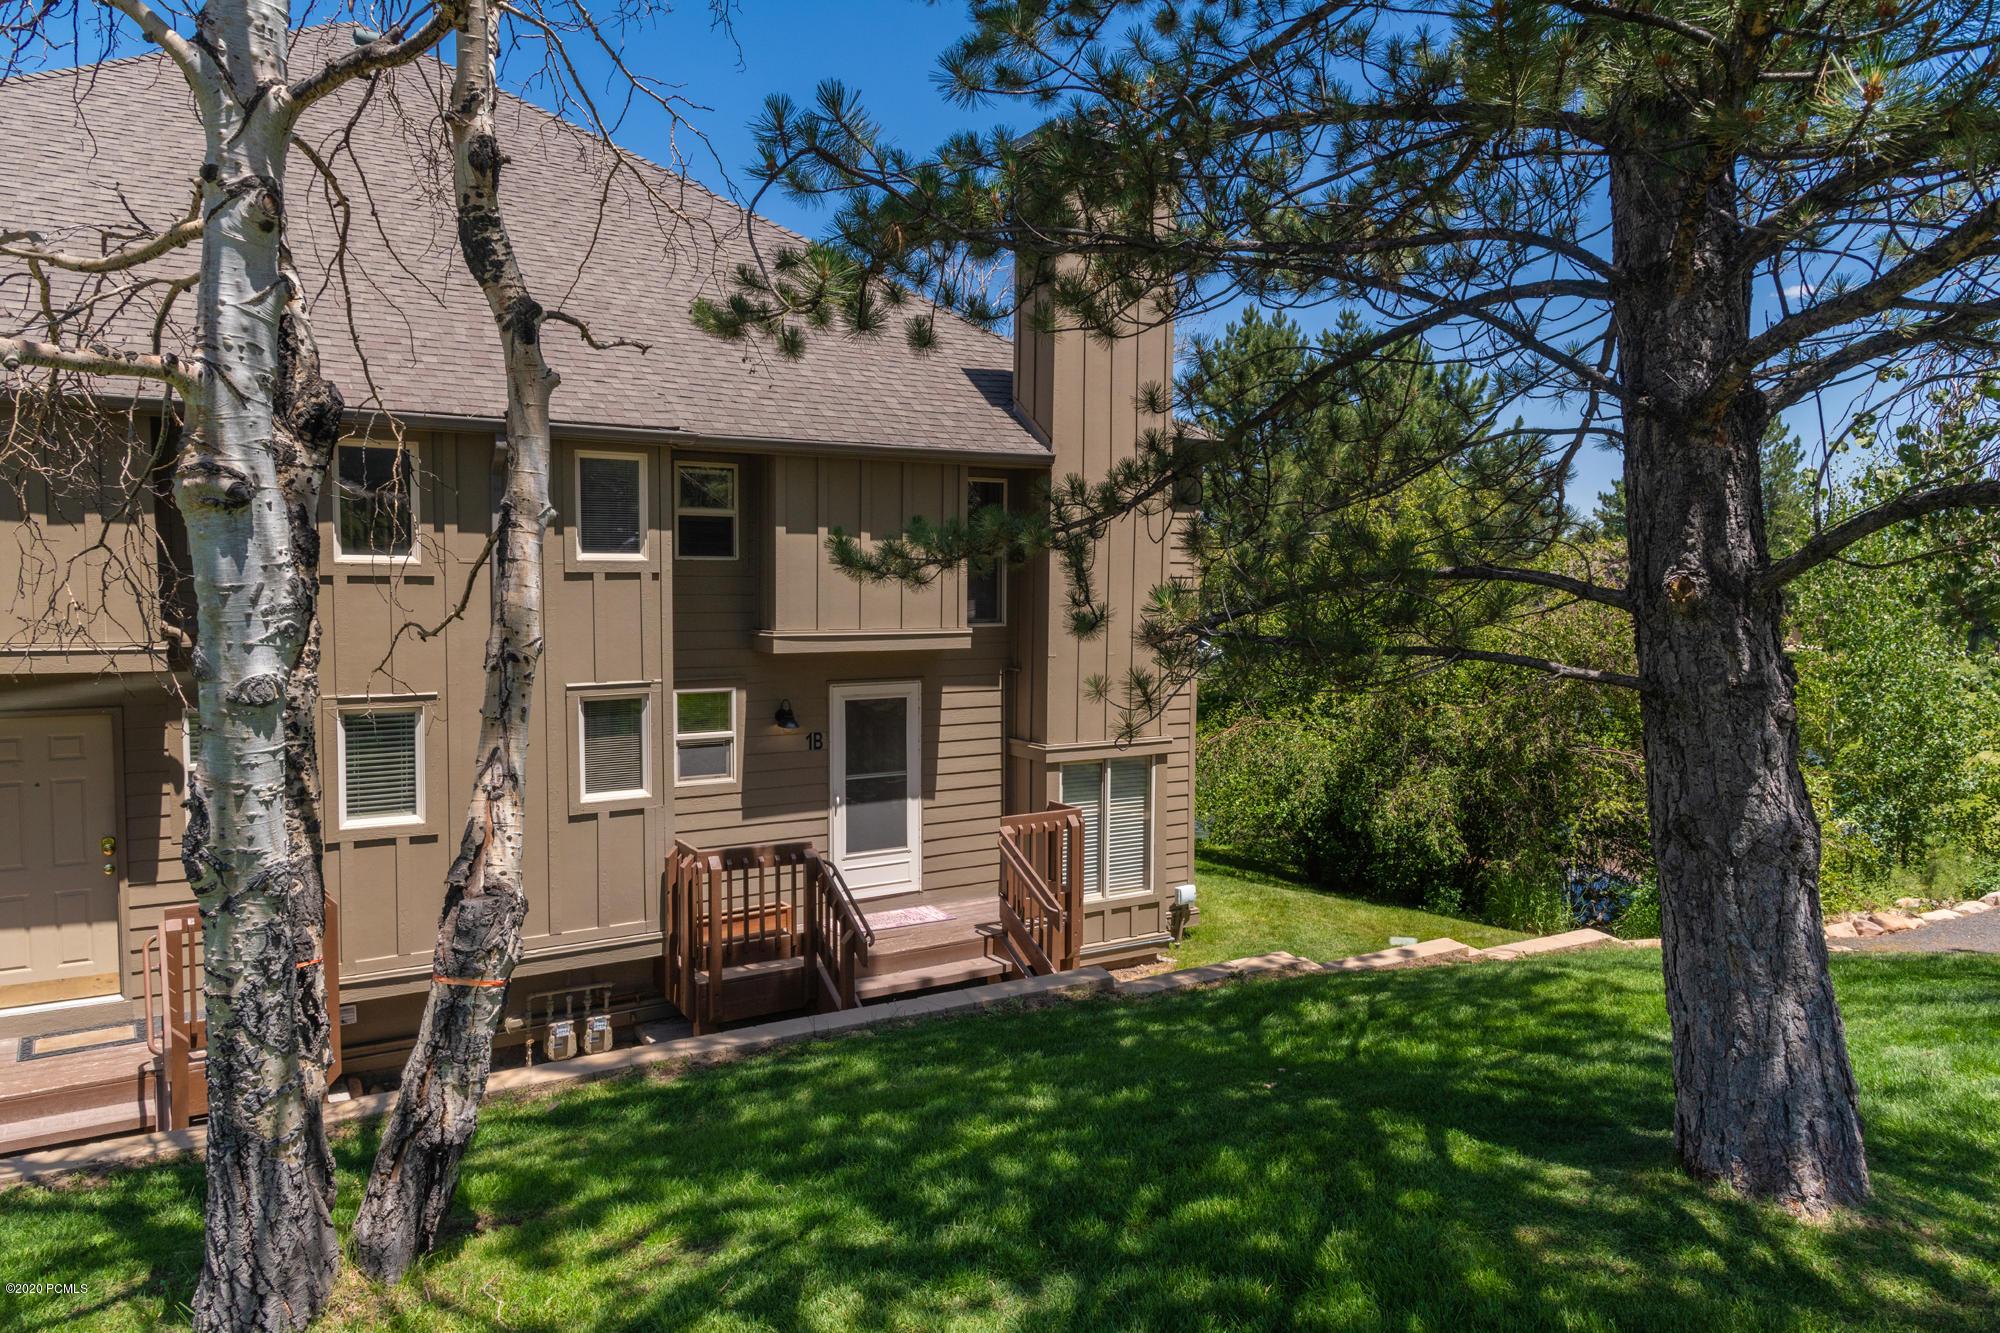 Park City, Utah 84098, 2 Bedrooms Bedrooms, ,2 BathroomsBathrooms,Condominium,For Sale,20190109112430415765000000